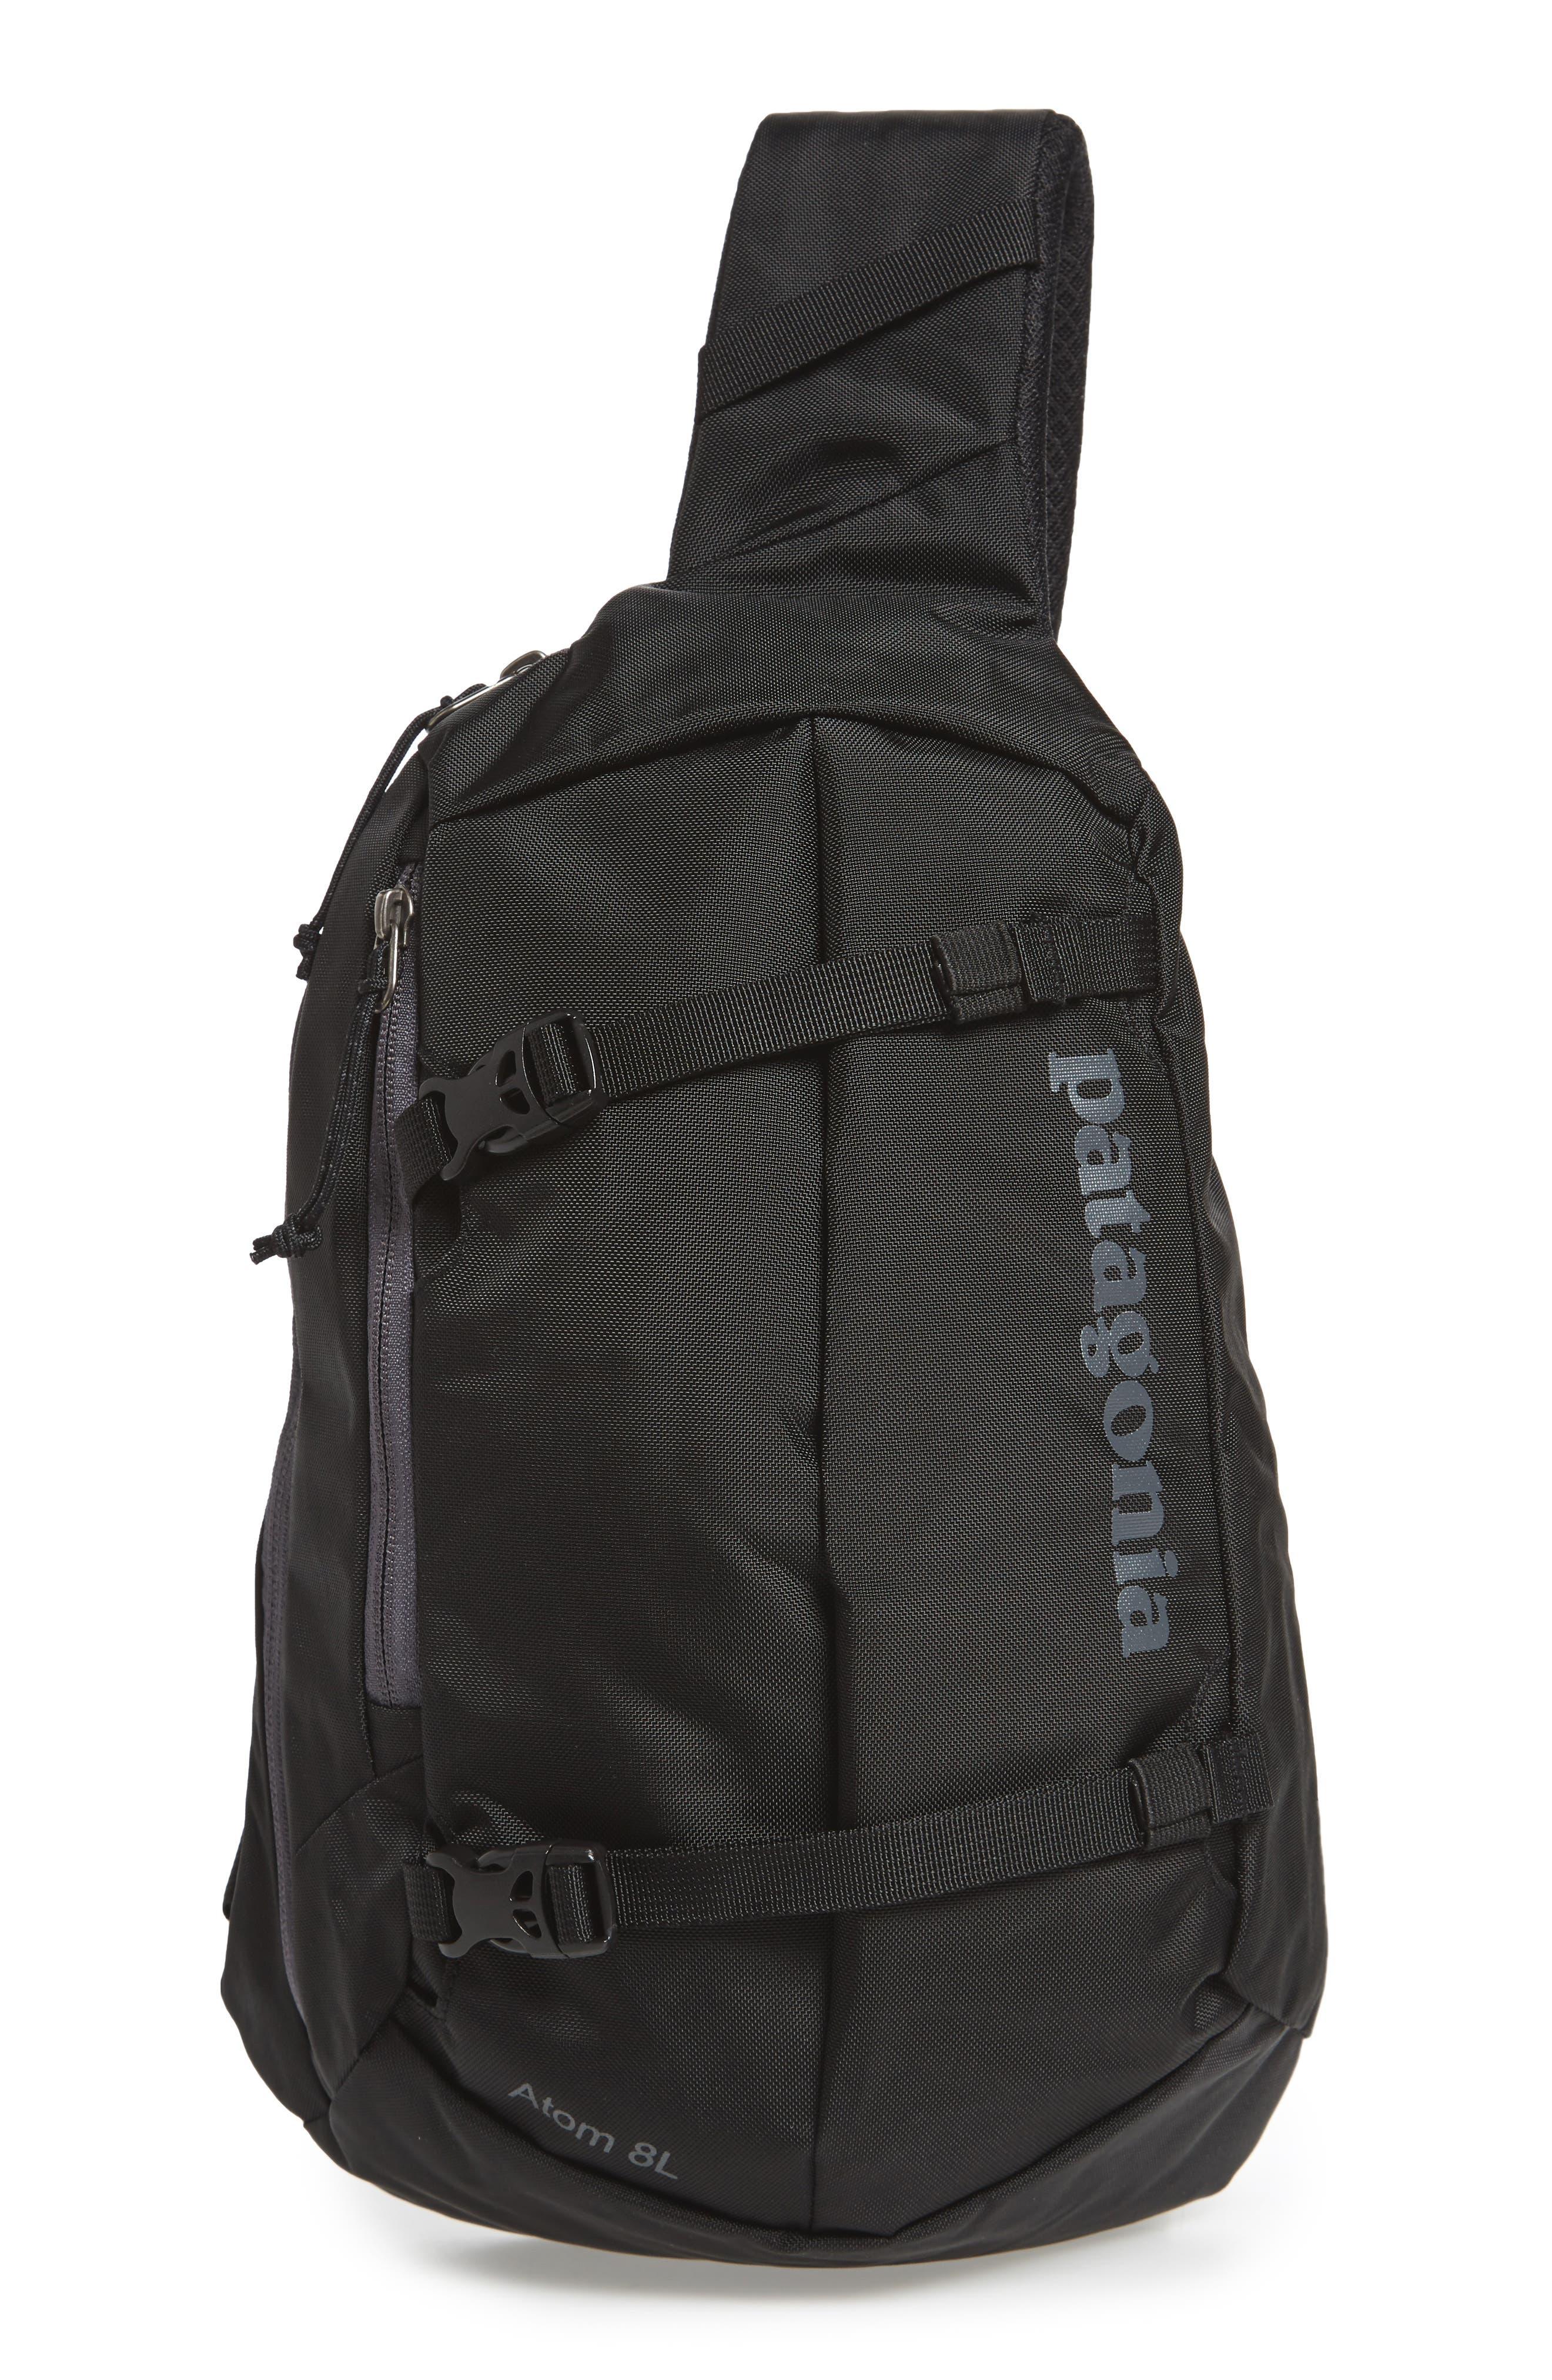 PATAGONIA Atom 8L Sling Backpack, Main, color, BLACK